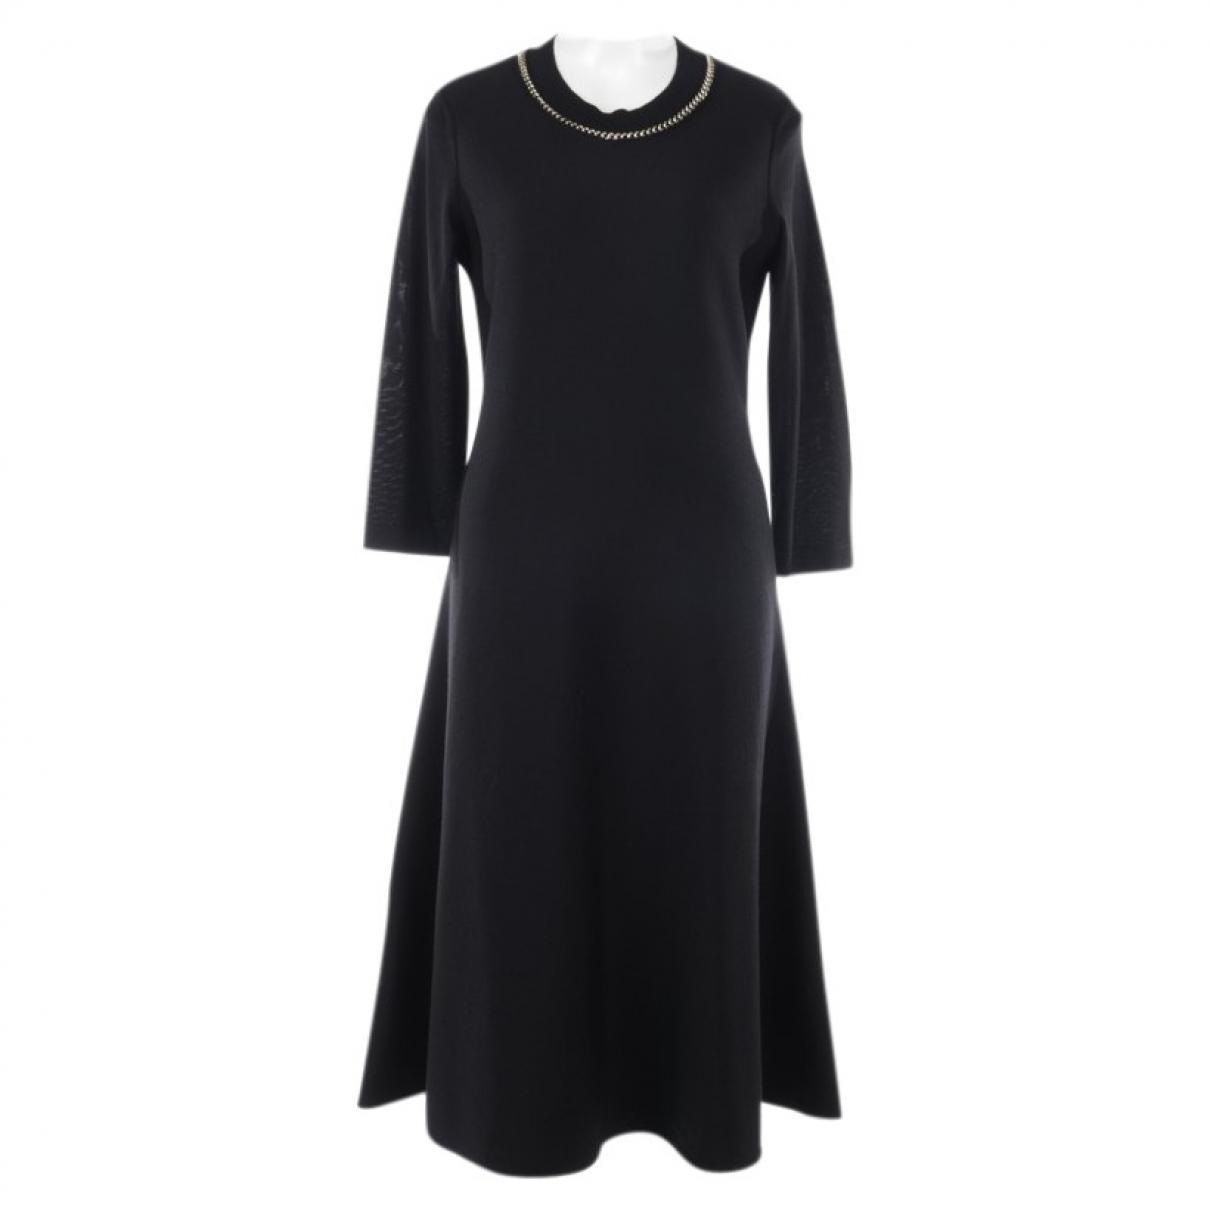 Salvatore Ferragamo \N Black Wool dress for Women L International